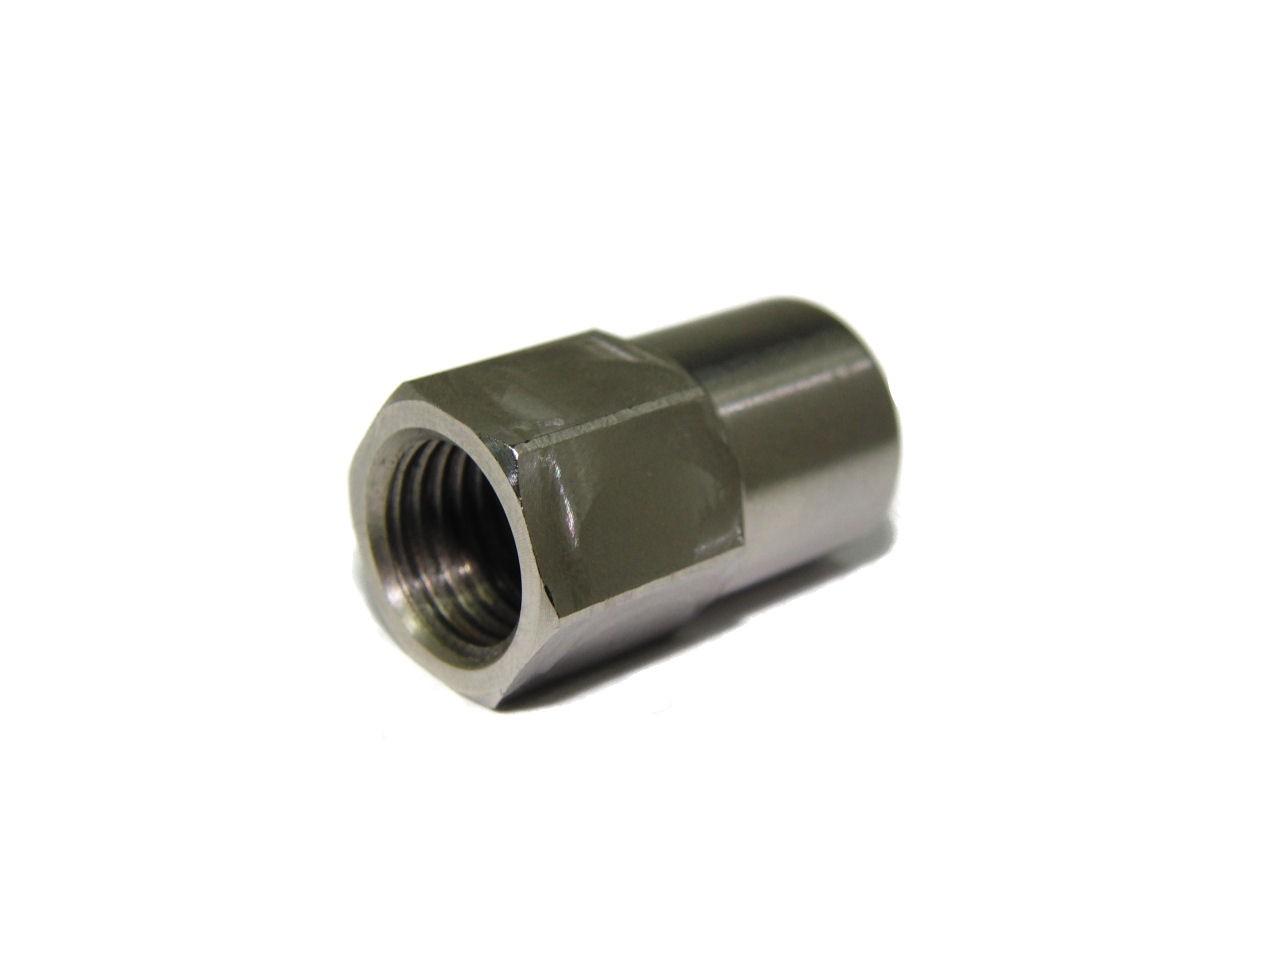 1/8 BSP - 5mm Adaptor F / F